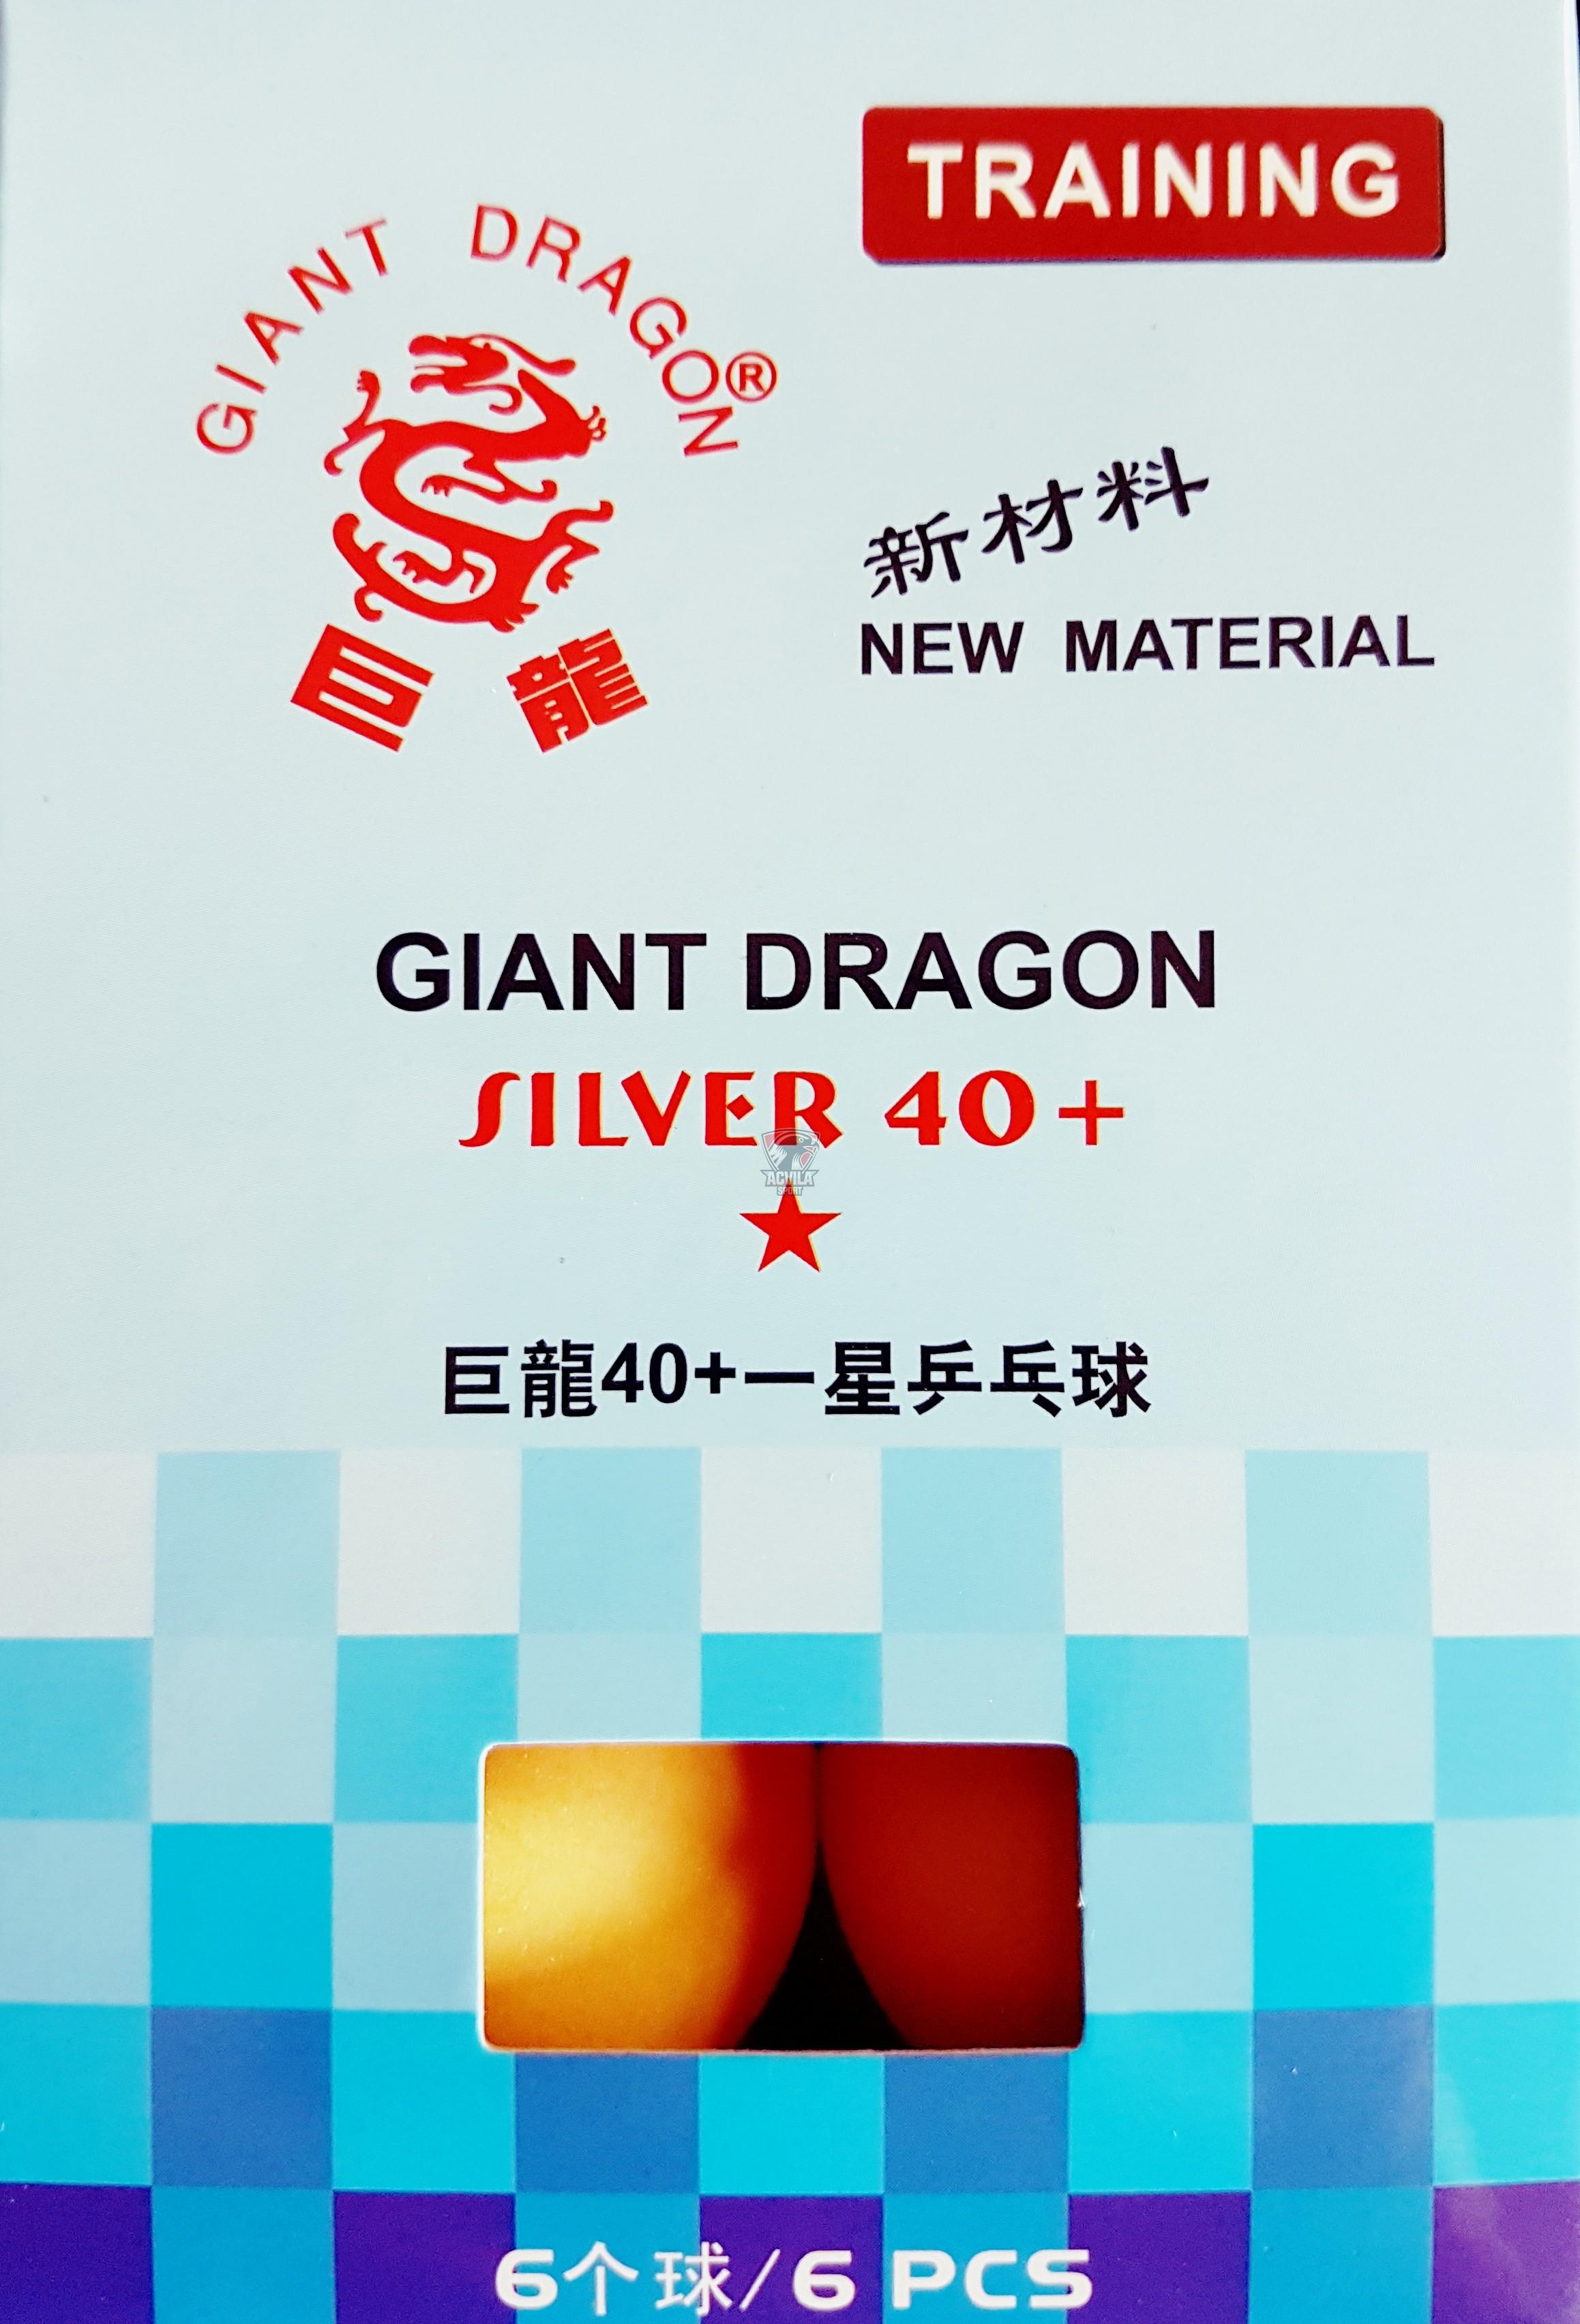 photo 2 Minge tenis masă Giant Dragon Silver 40+ 1 stea